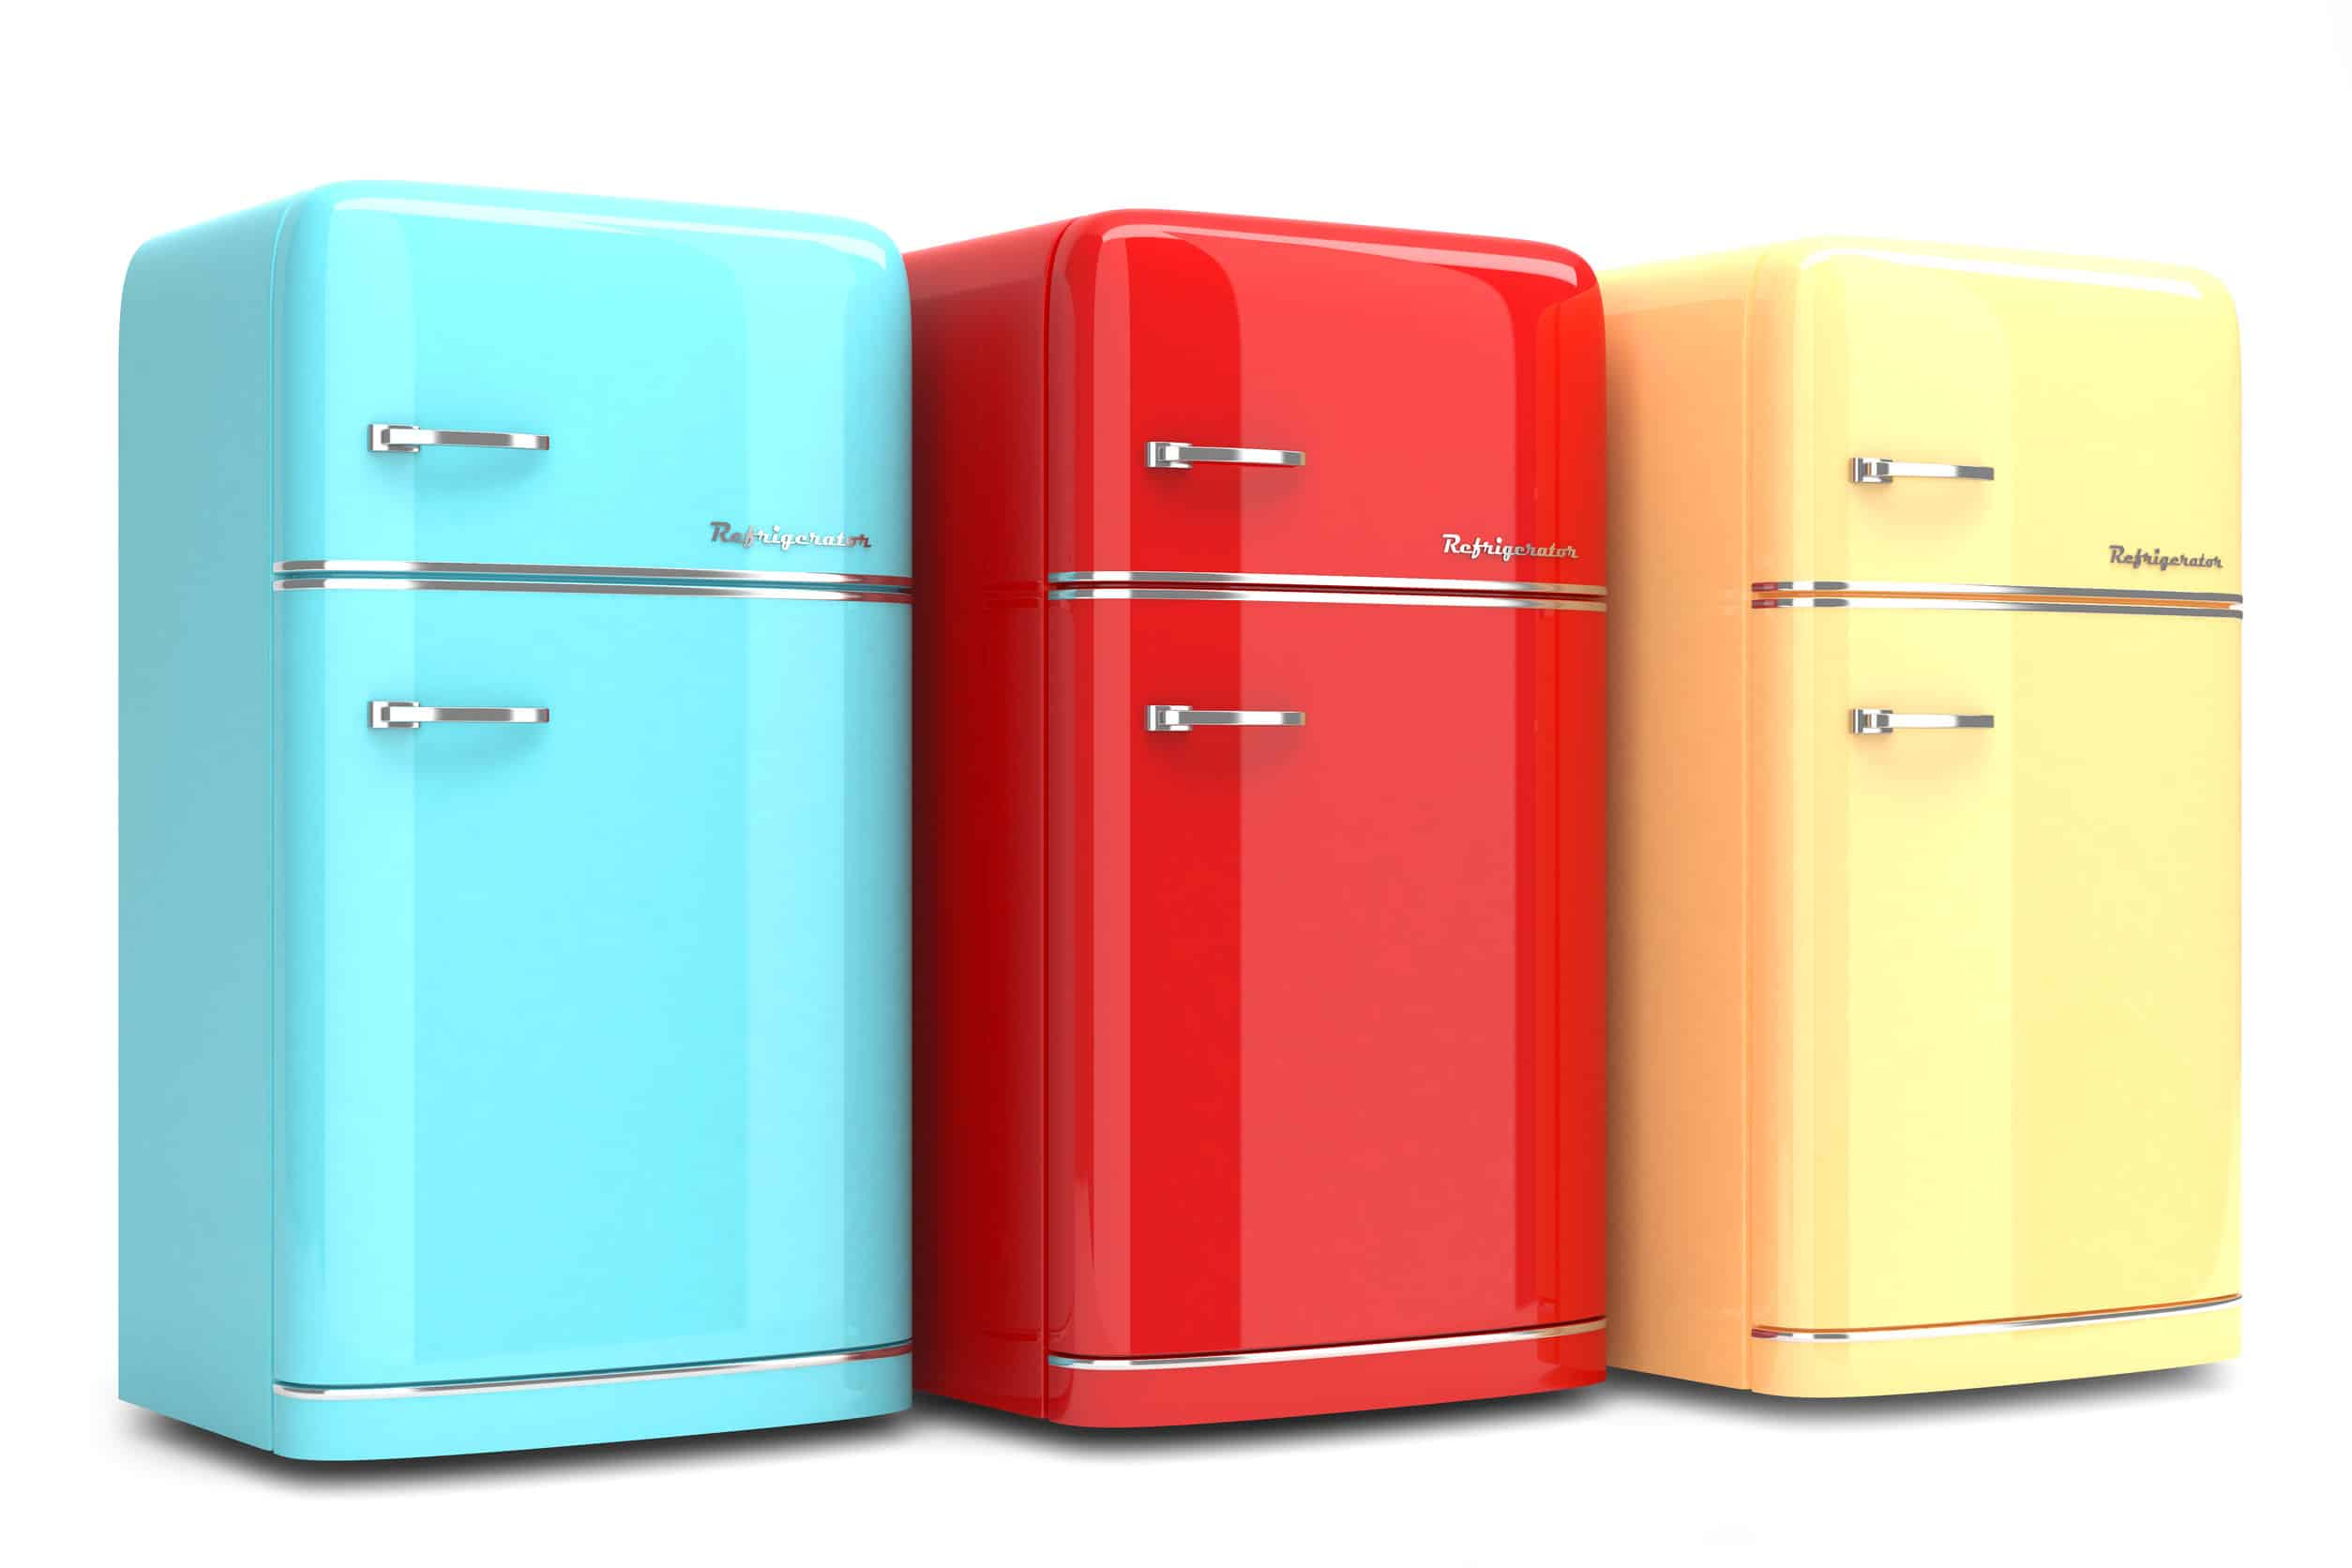 Side By Side Kühlschrank Test 2018 : Freistehender kühlschrank test die besten kühlschränke im